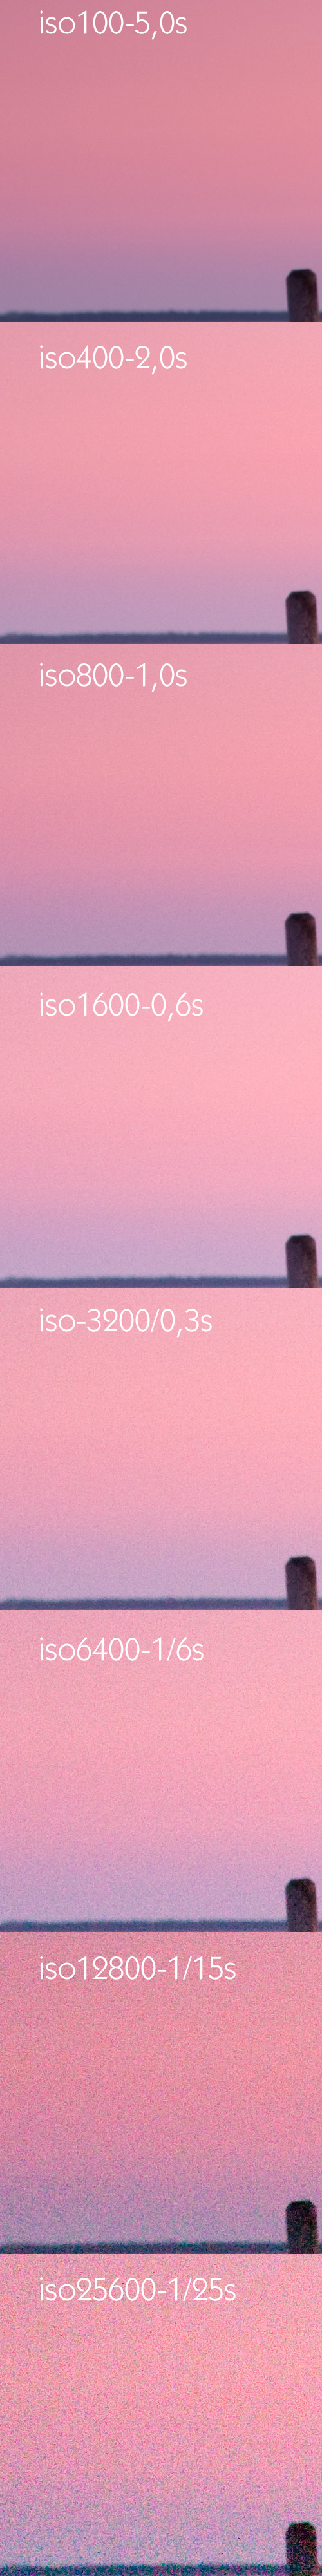 5d-mark-ii-iso-test-rauschen